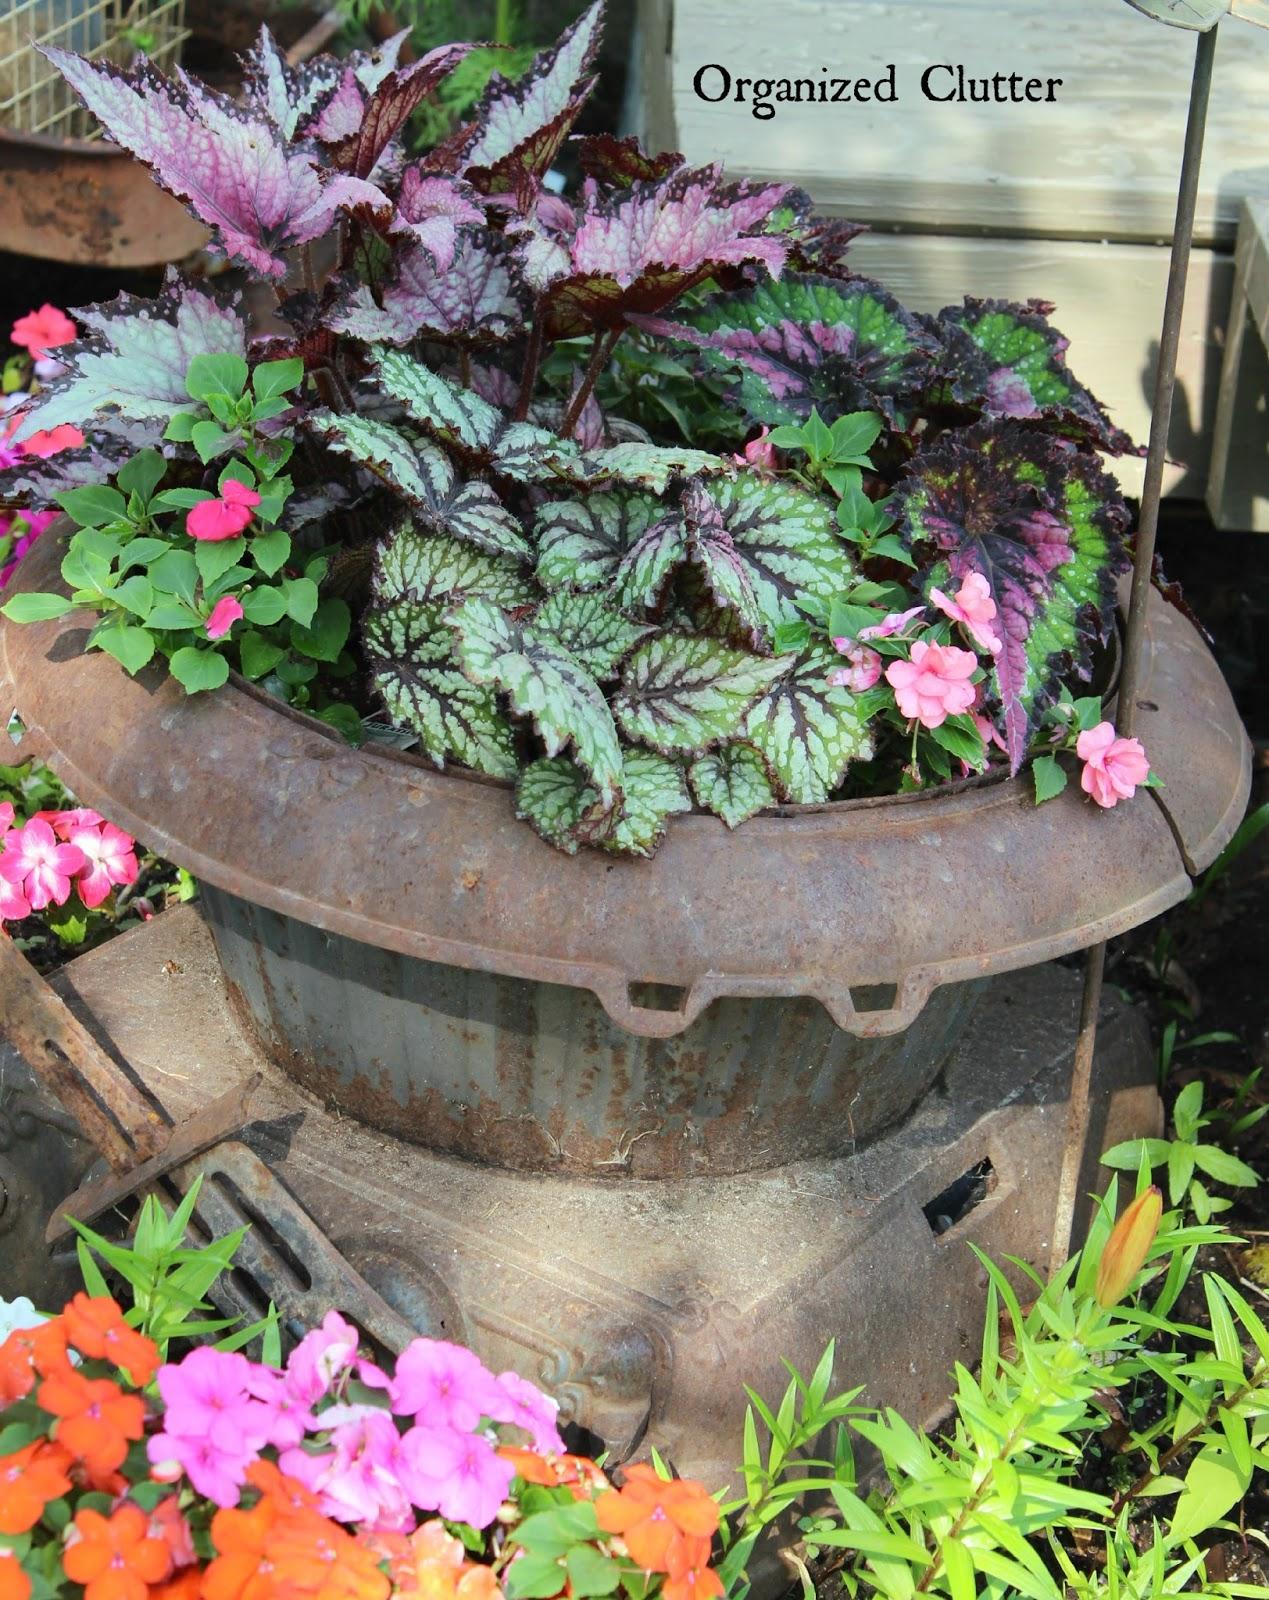 jurassic begonias impatiens planted in iron stove wwworganizedclutternet